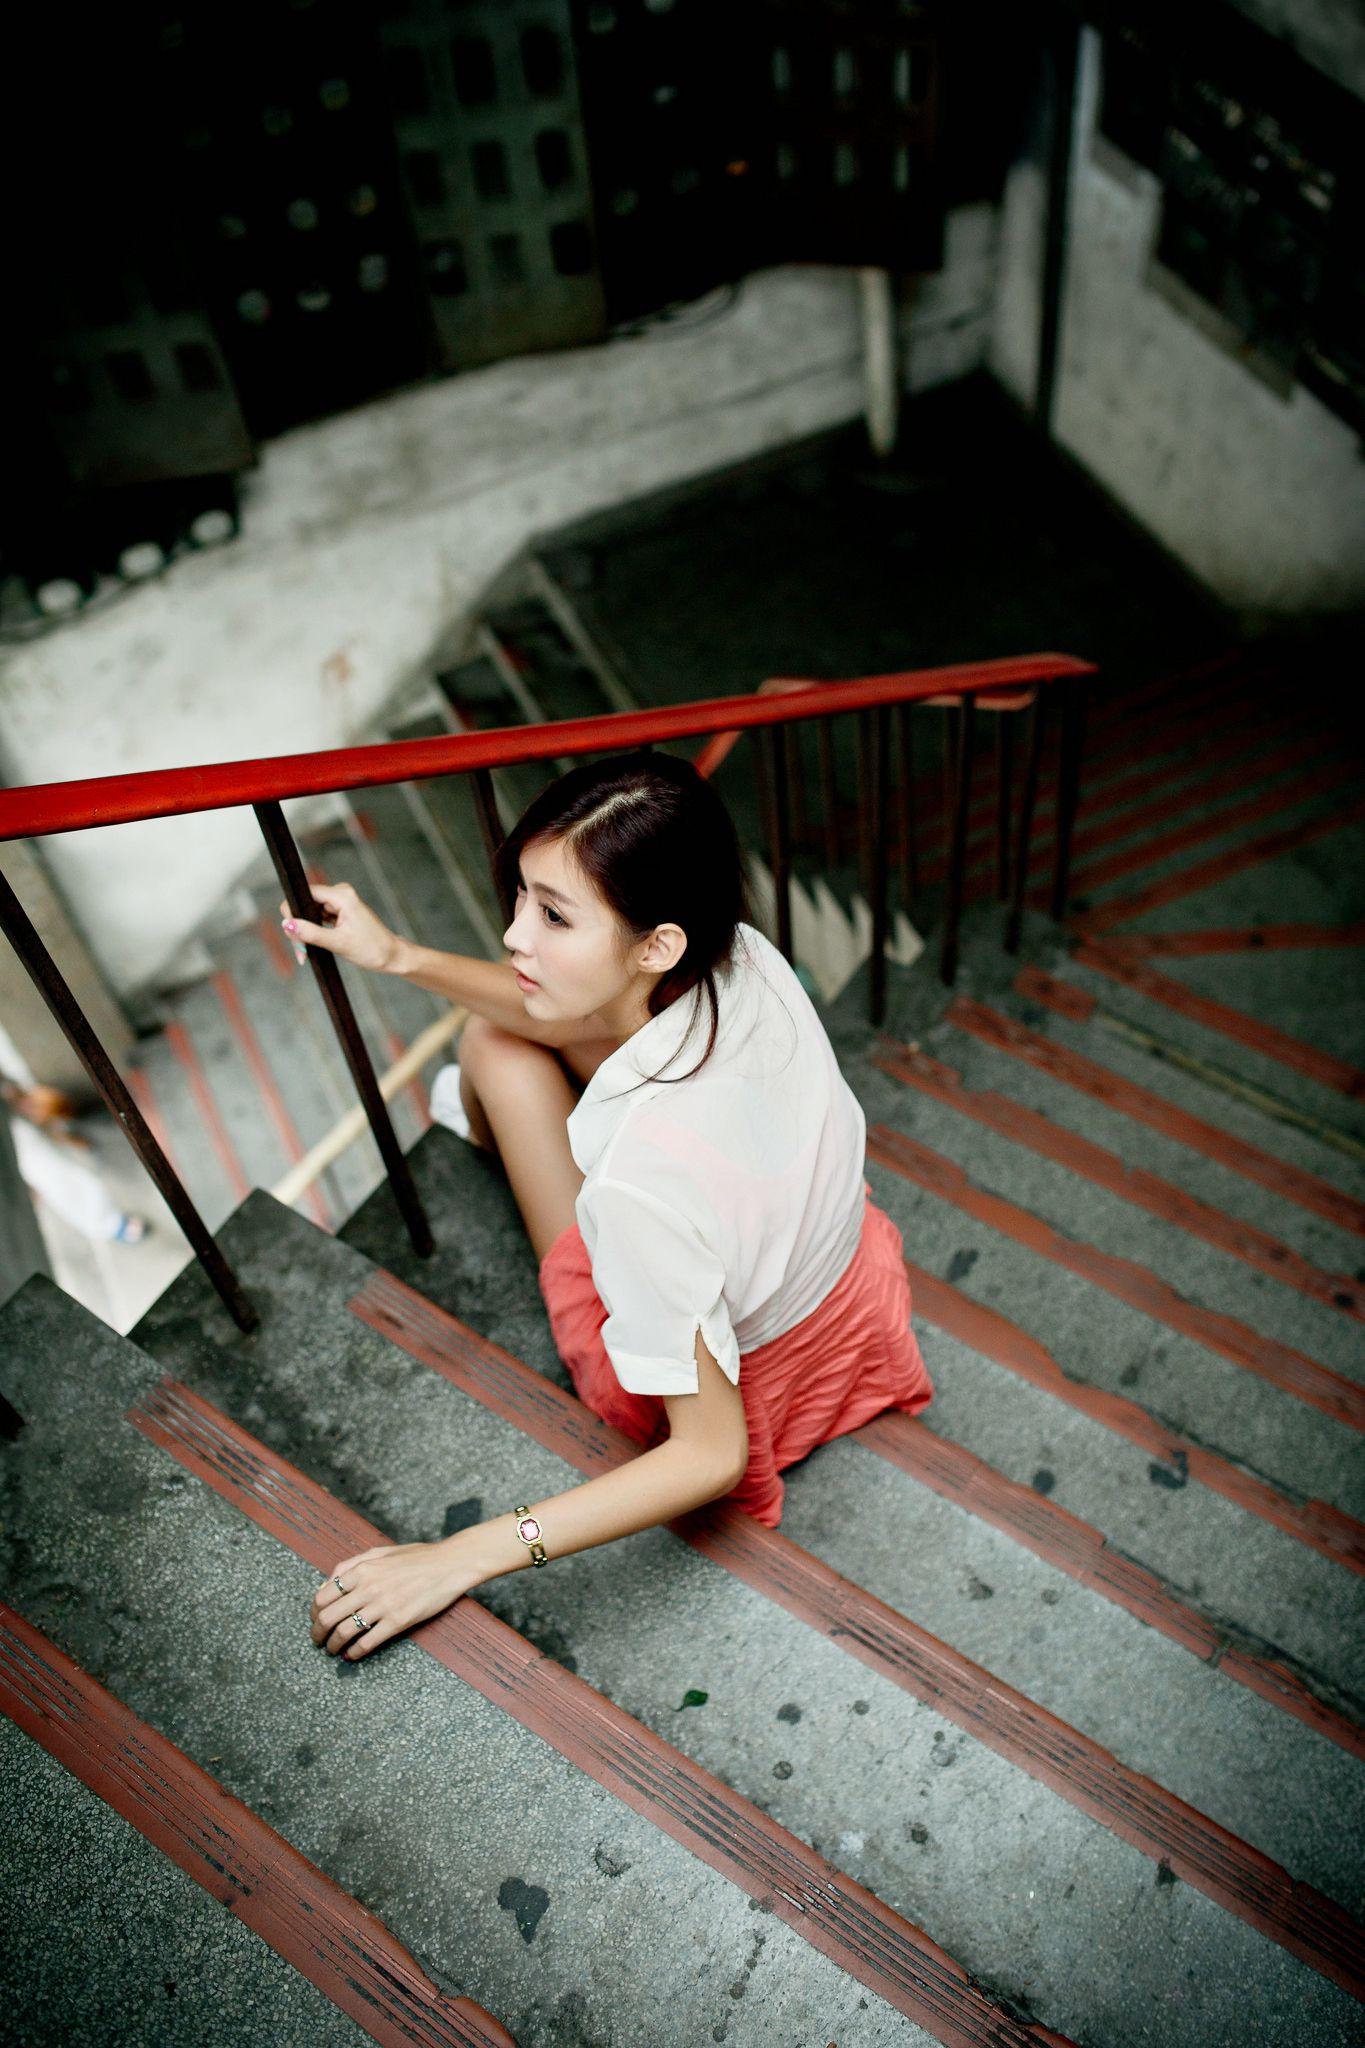 VOL.303 [台湾正妹]极品清新唯美外拍正妹:金允乔(廖挺伶,kila晶晶)高品质写真套图(149P)